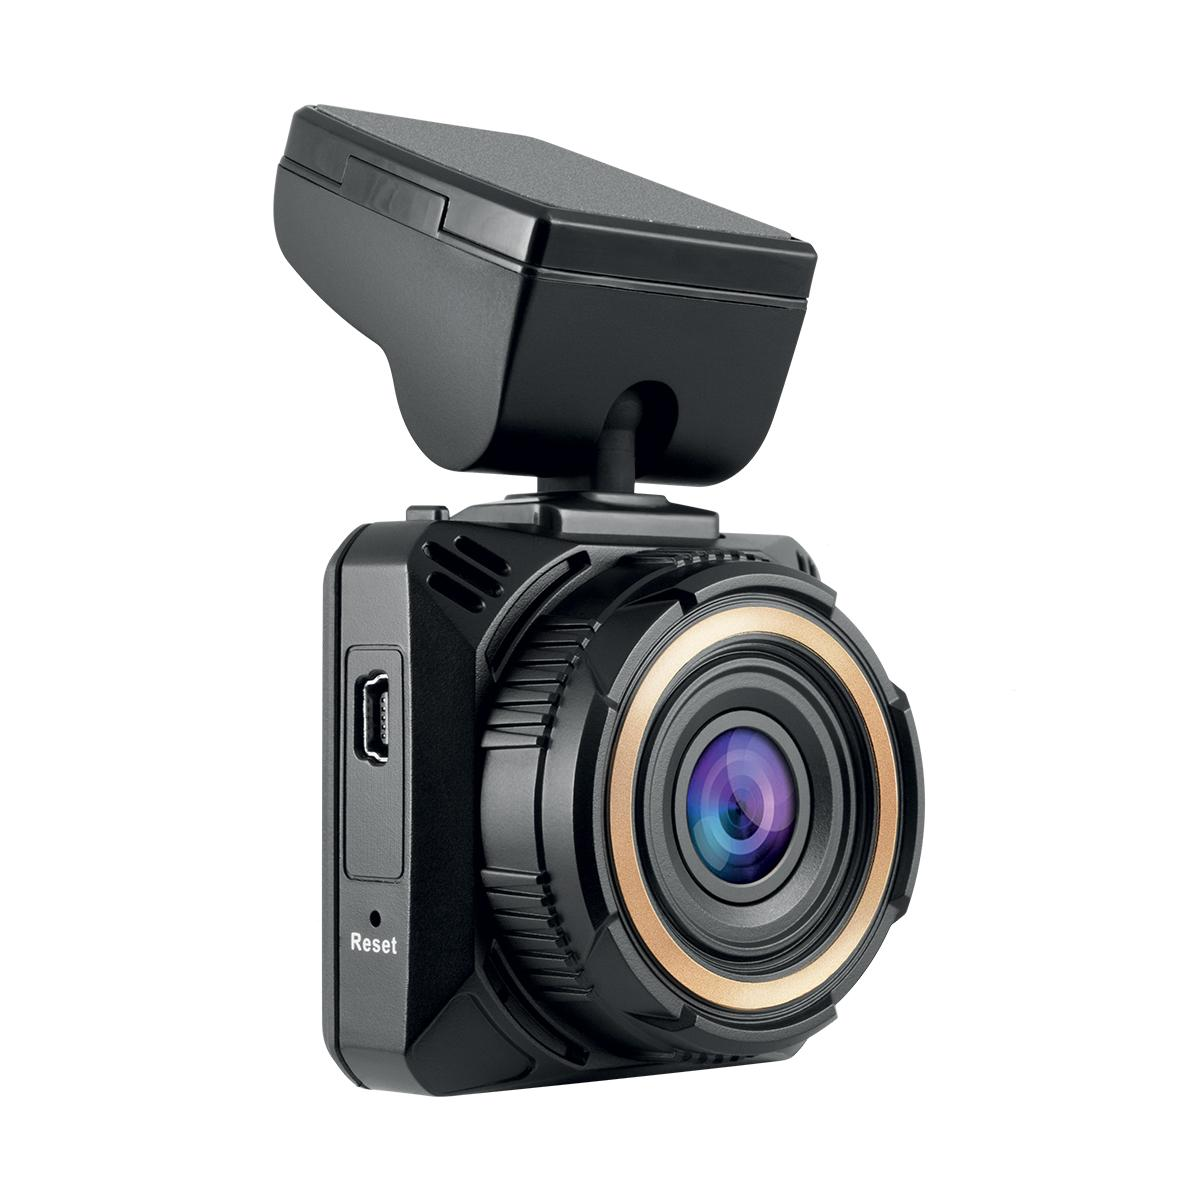 Dashcam NAVR600QHD NAVITEL NAVR600QHD originales de qualité